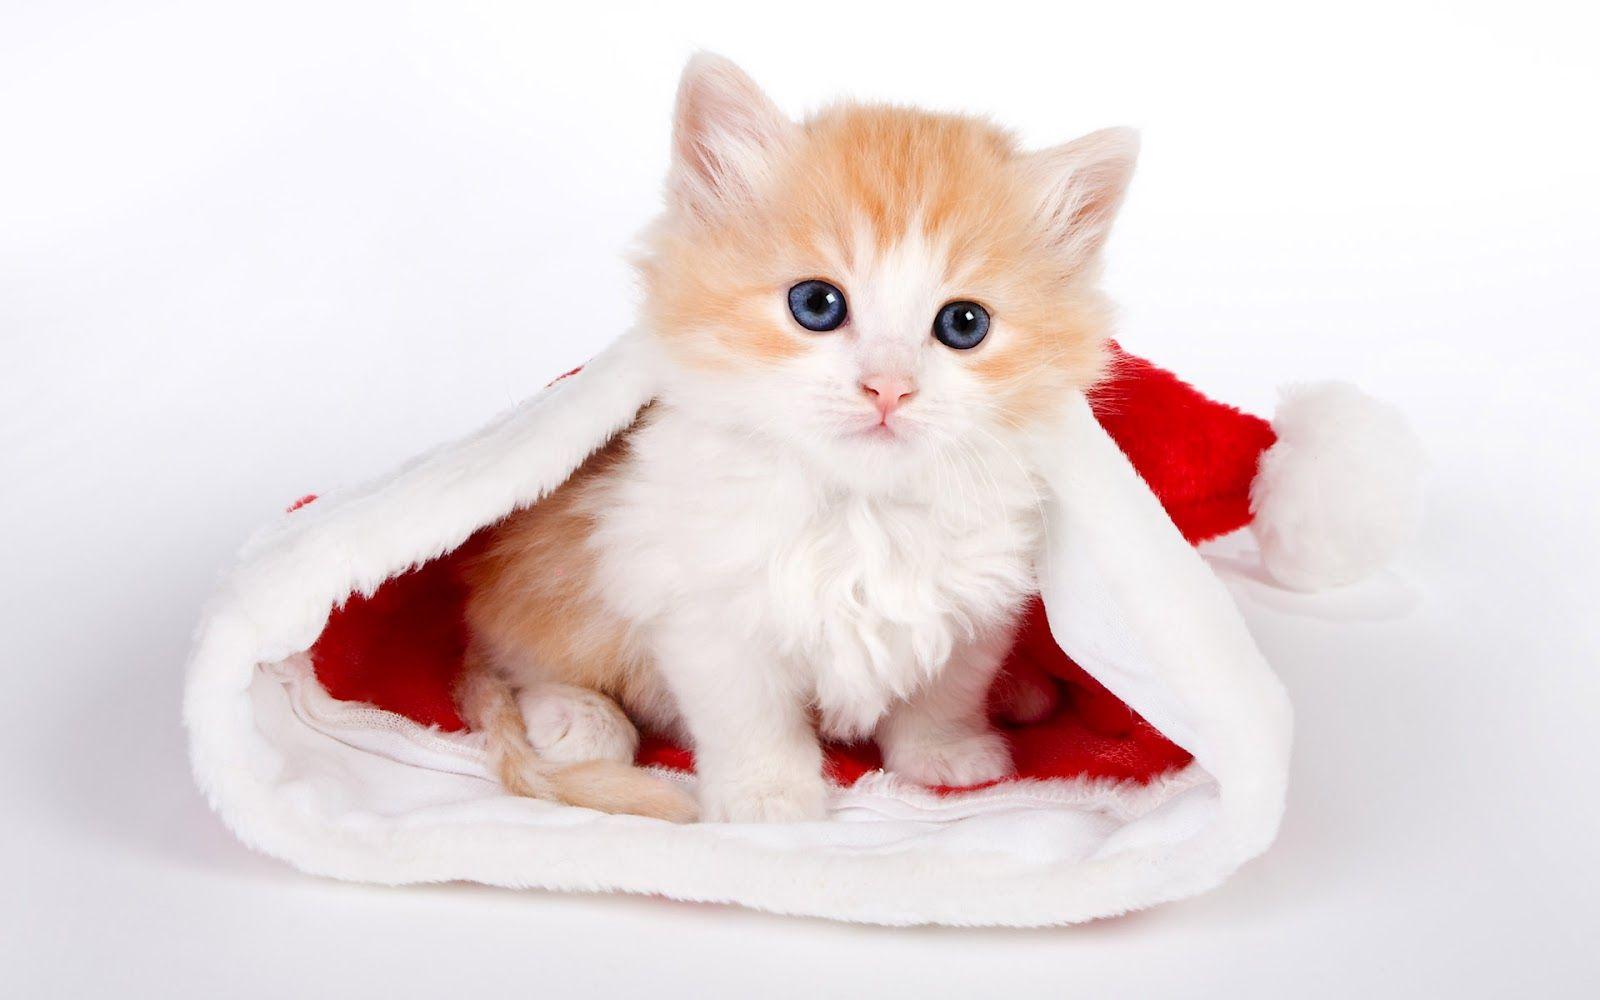 Kucing Imut Anak Kucing Lucu Anak Kucing Unik Anak Kucing Imut